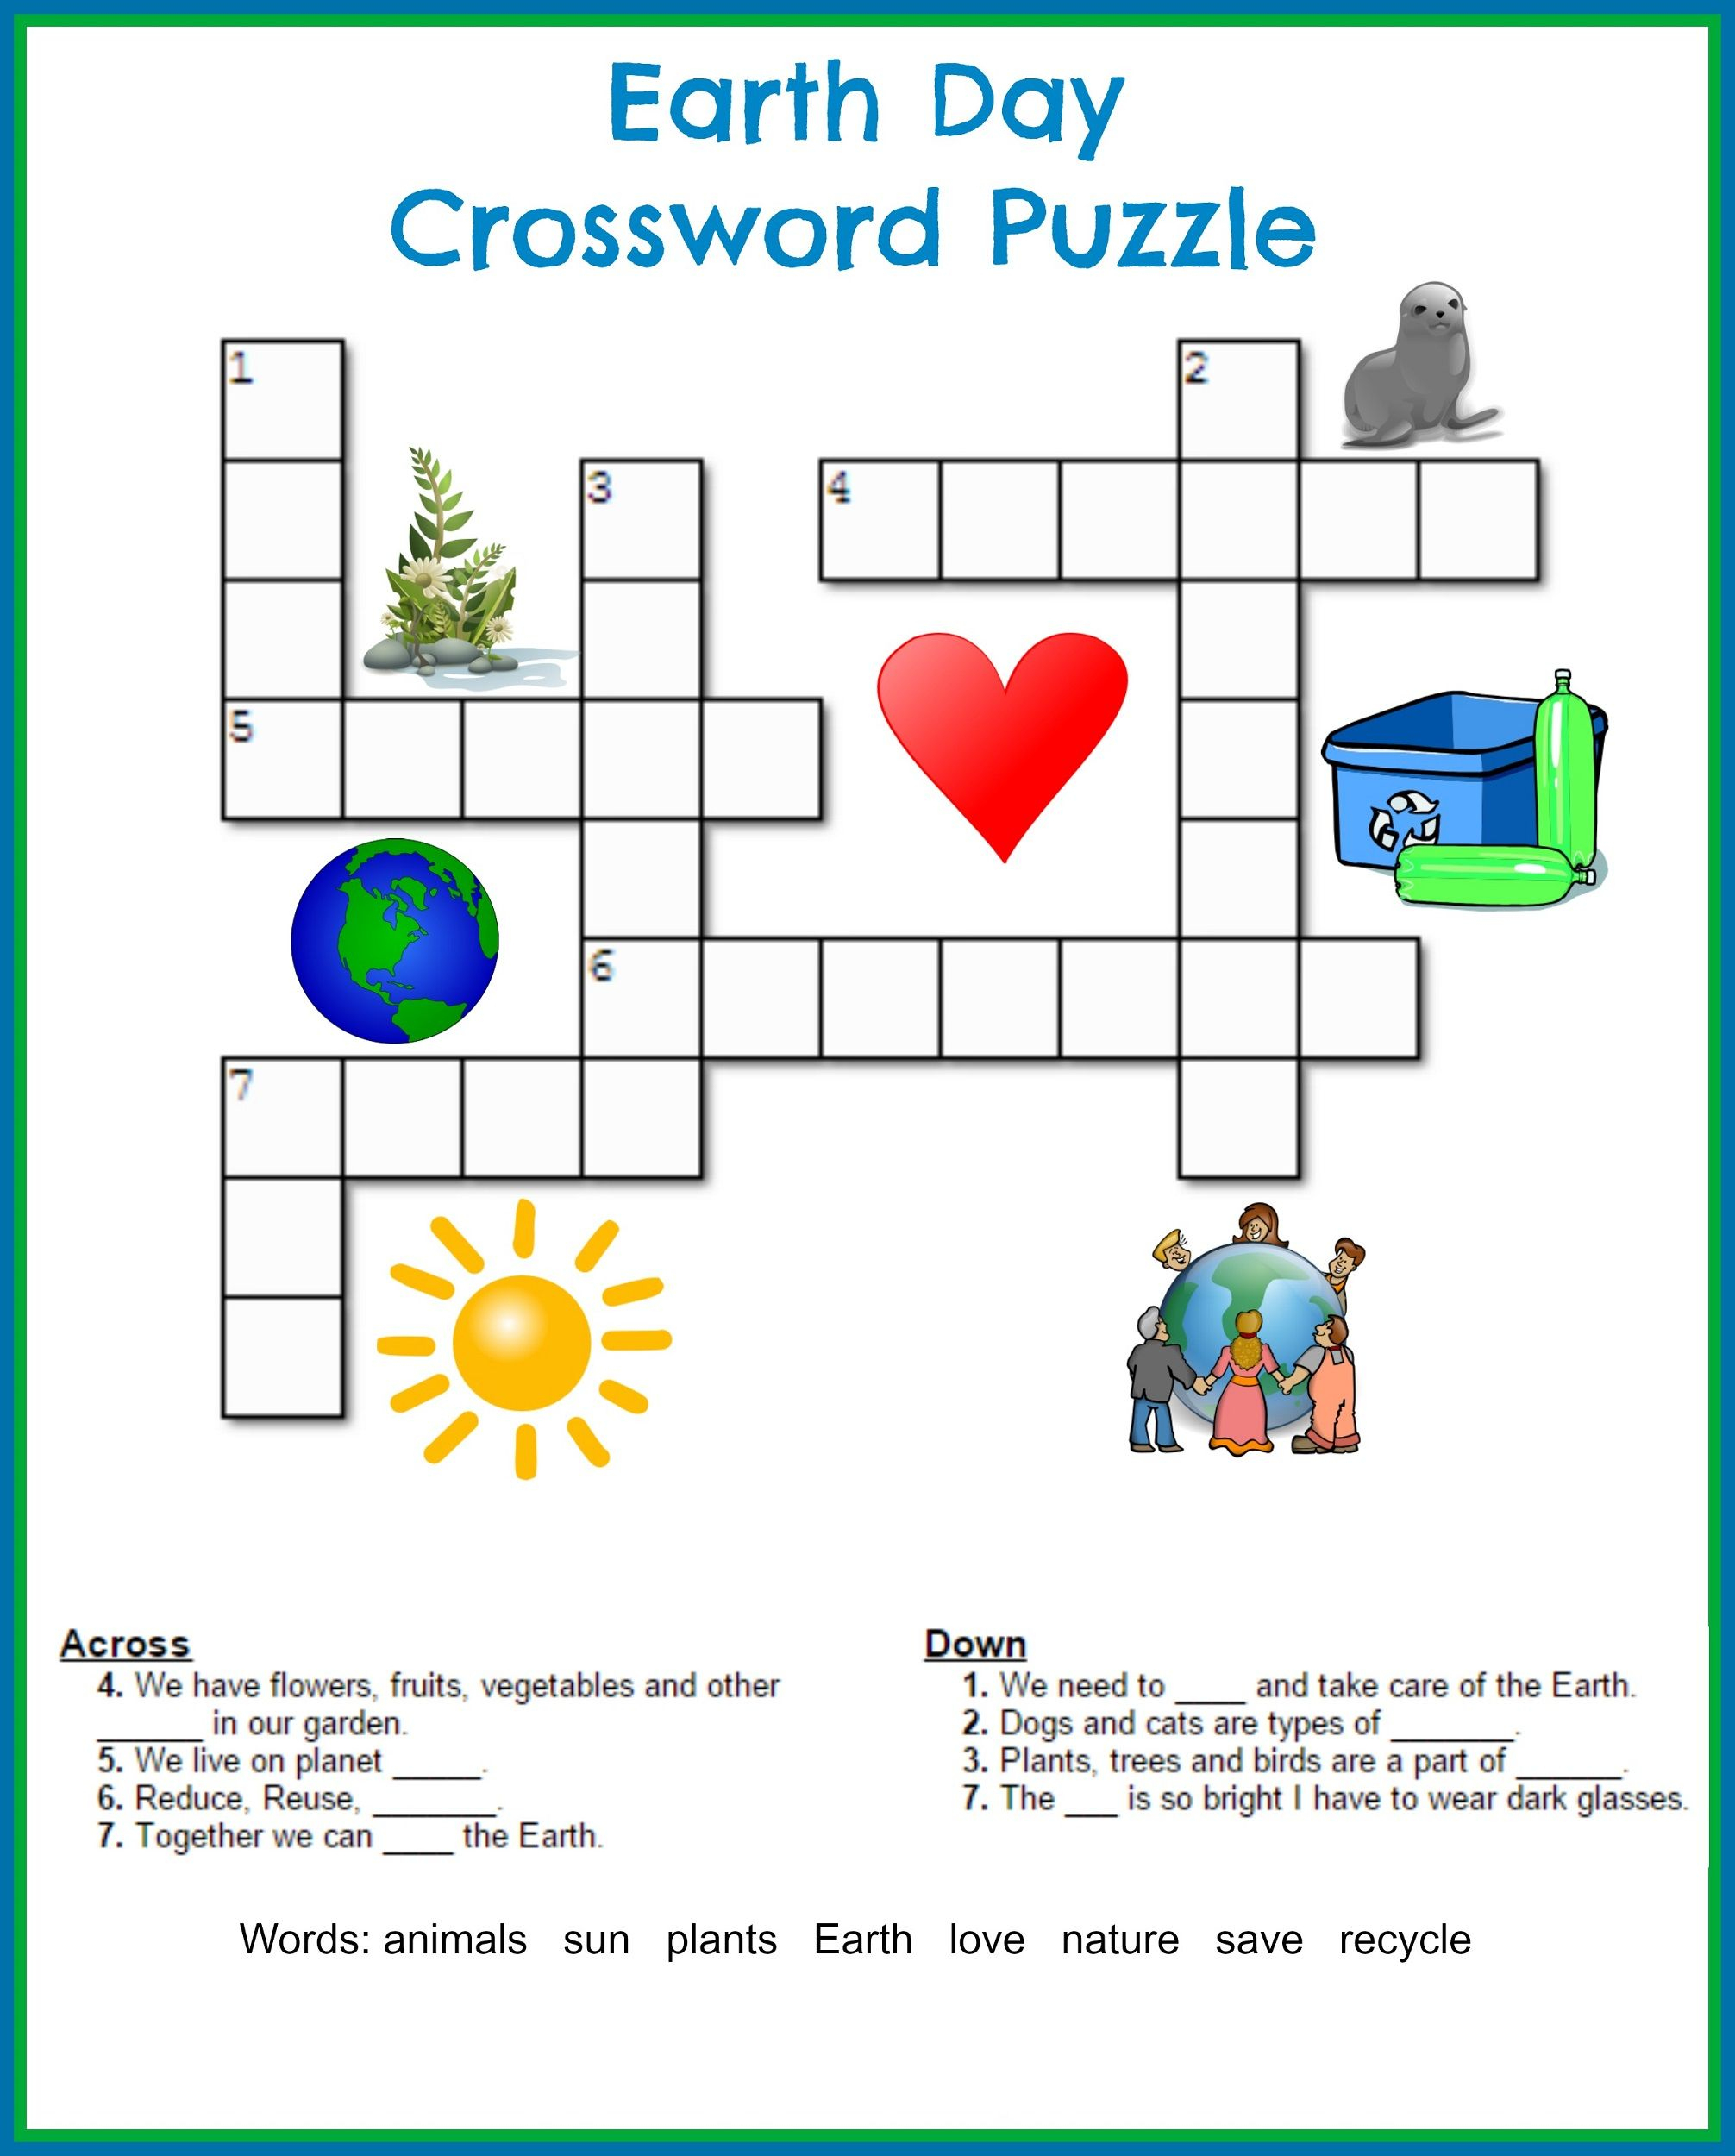 Printable Crossword Puzzles Kids | Crossword Puzzles On Earth - Printable Elementary Crossword Puzzles